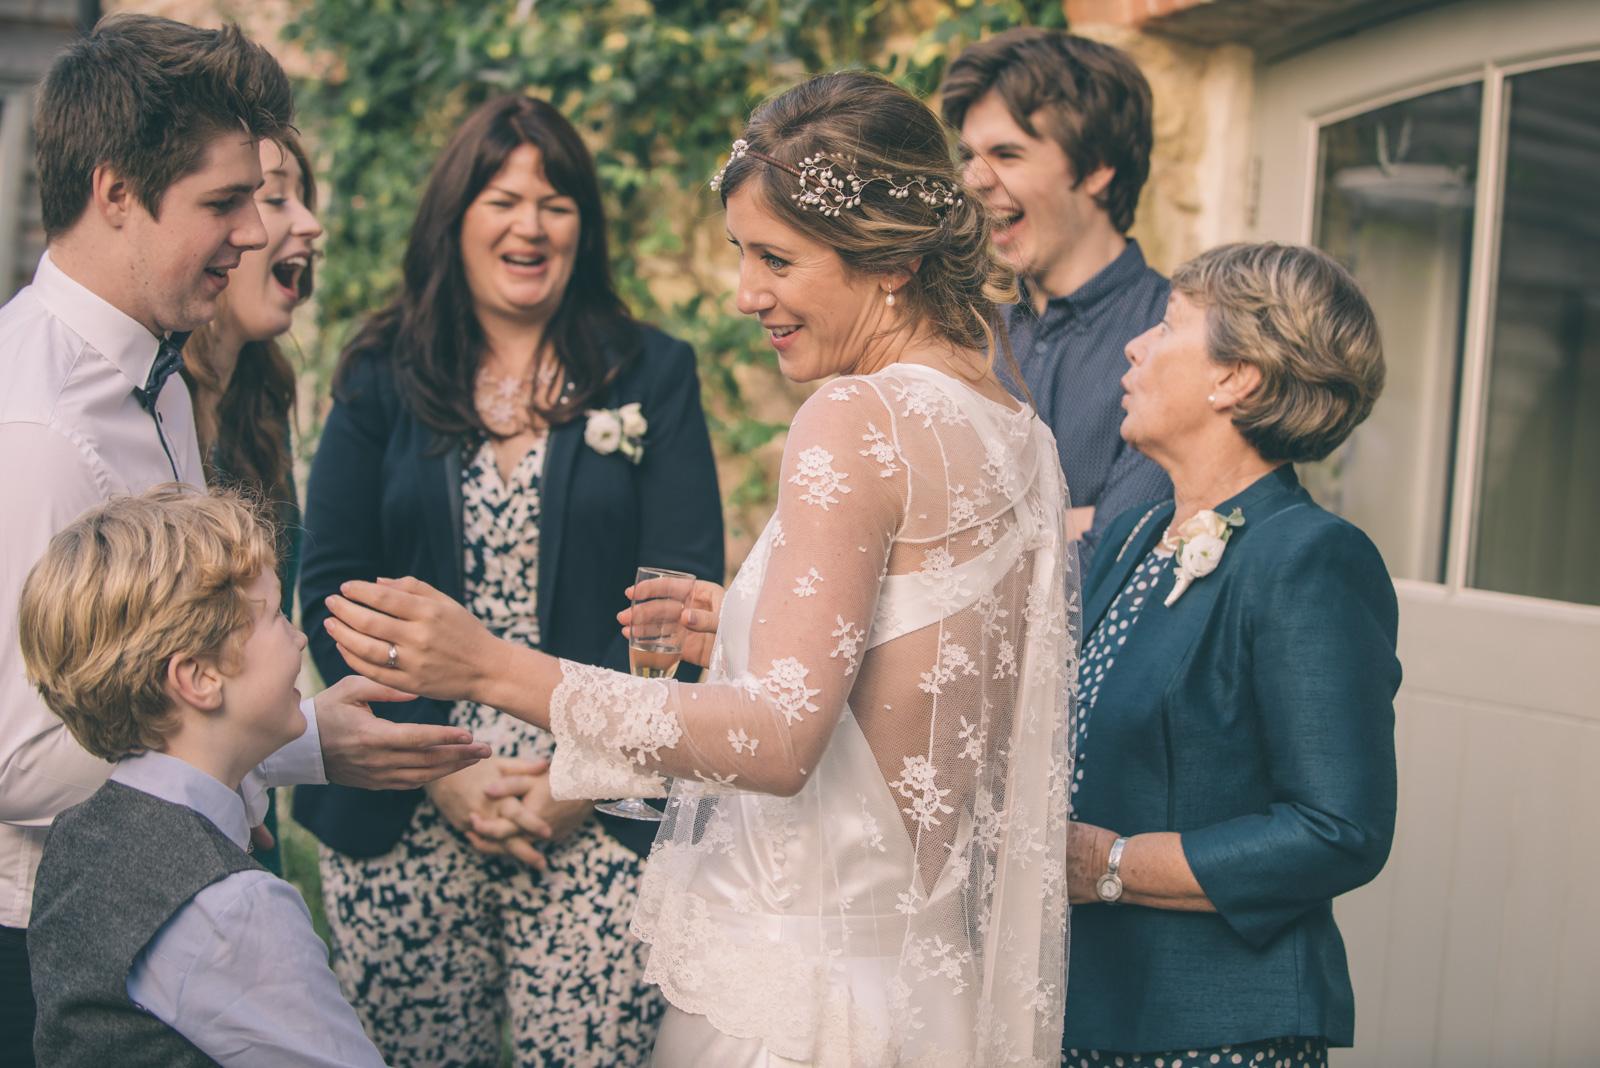 nancarrow-wedding-photography-108.jpg